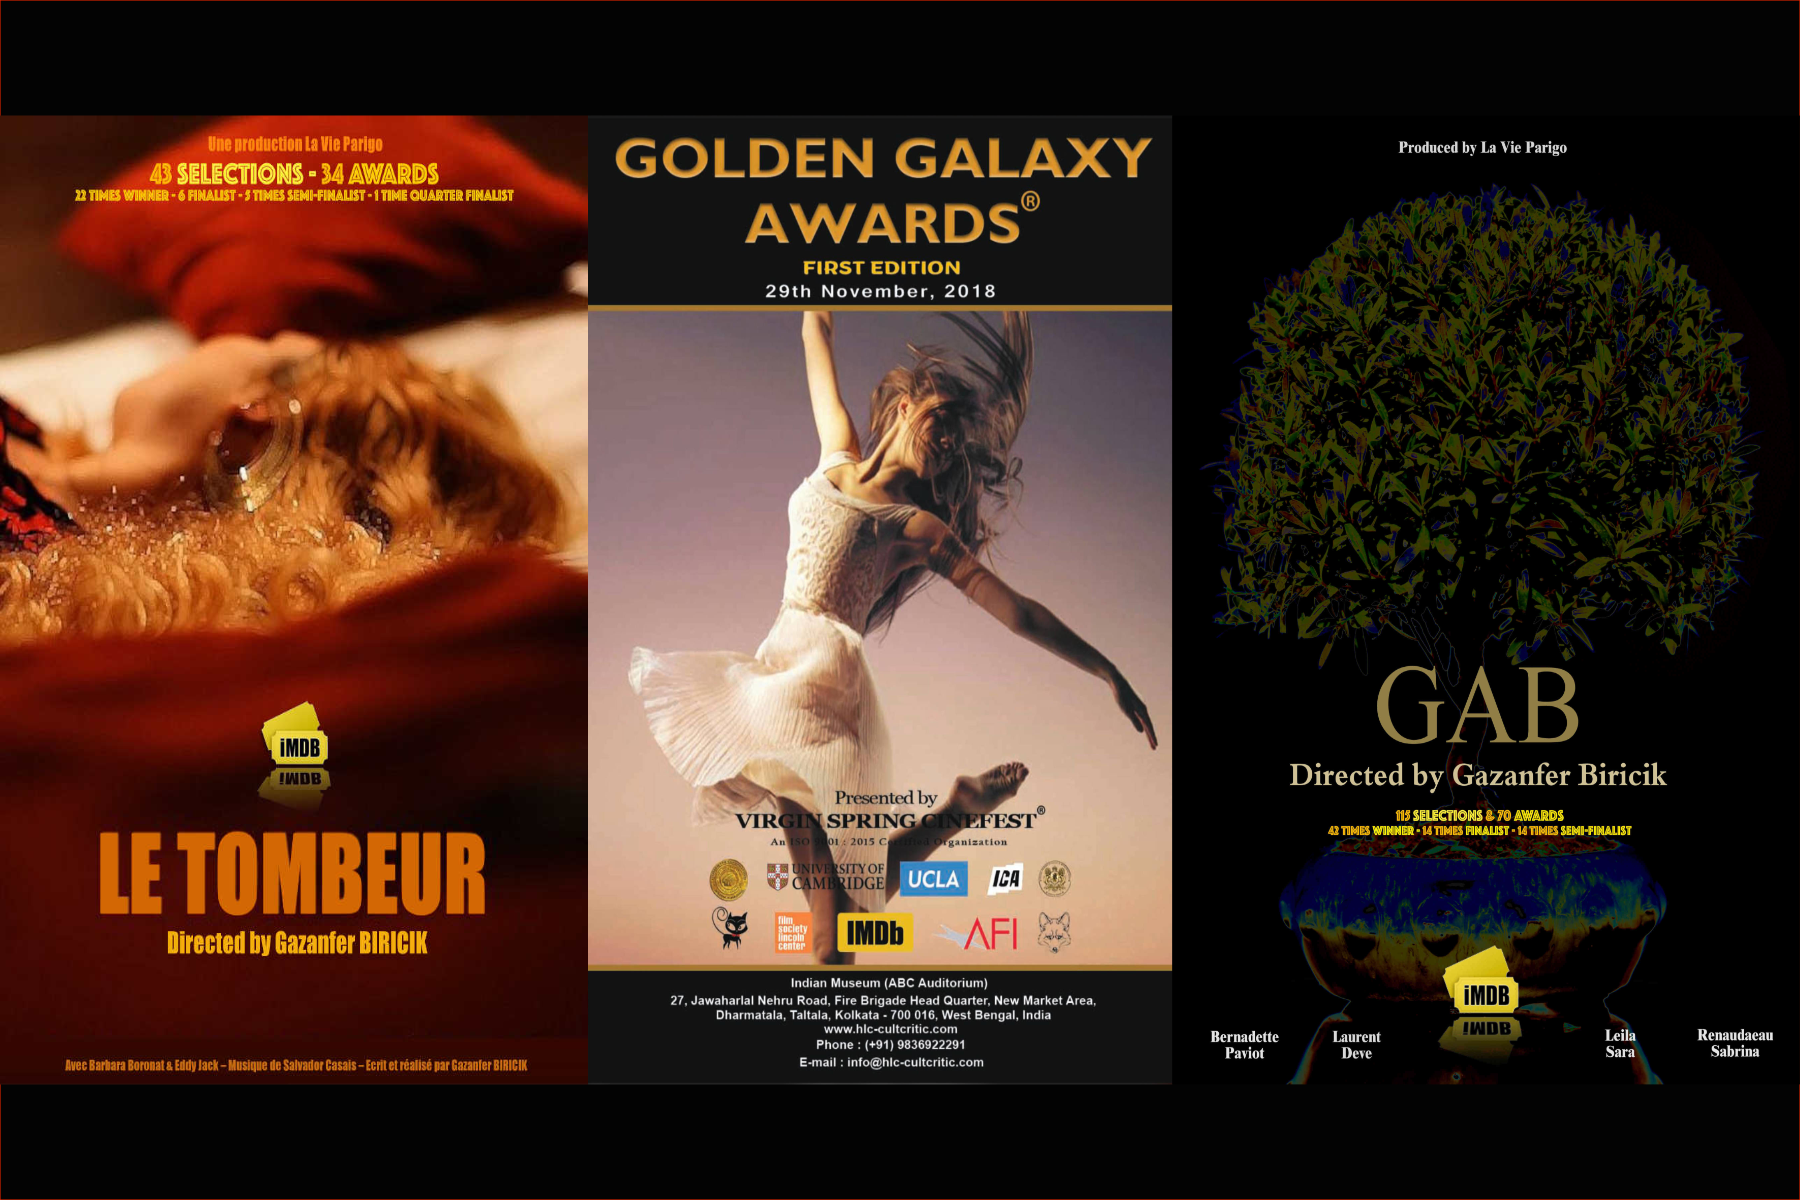 Golden Galaxy GAB & The Heartthrob